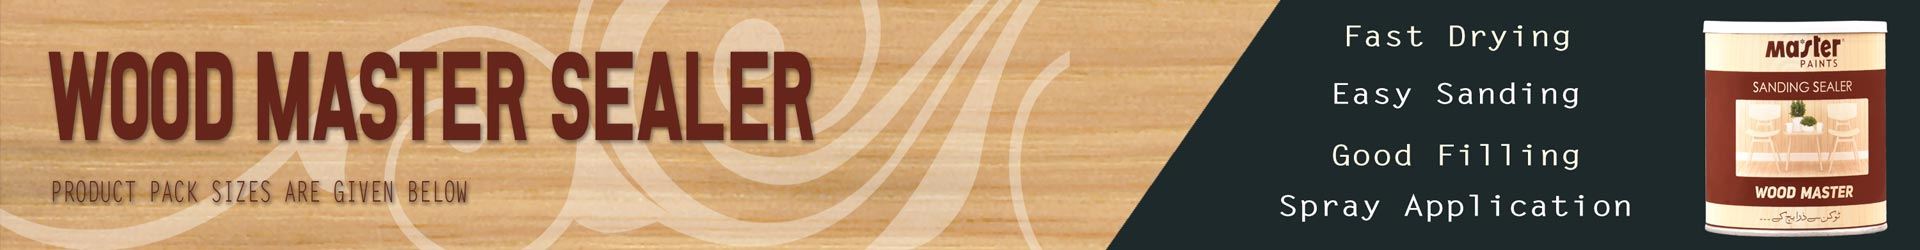 Wood Master Sealer